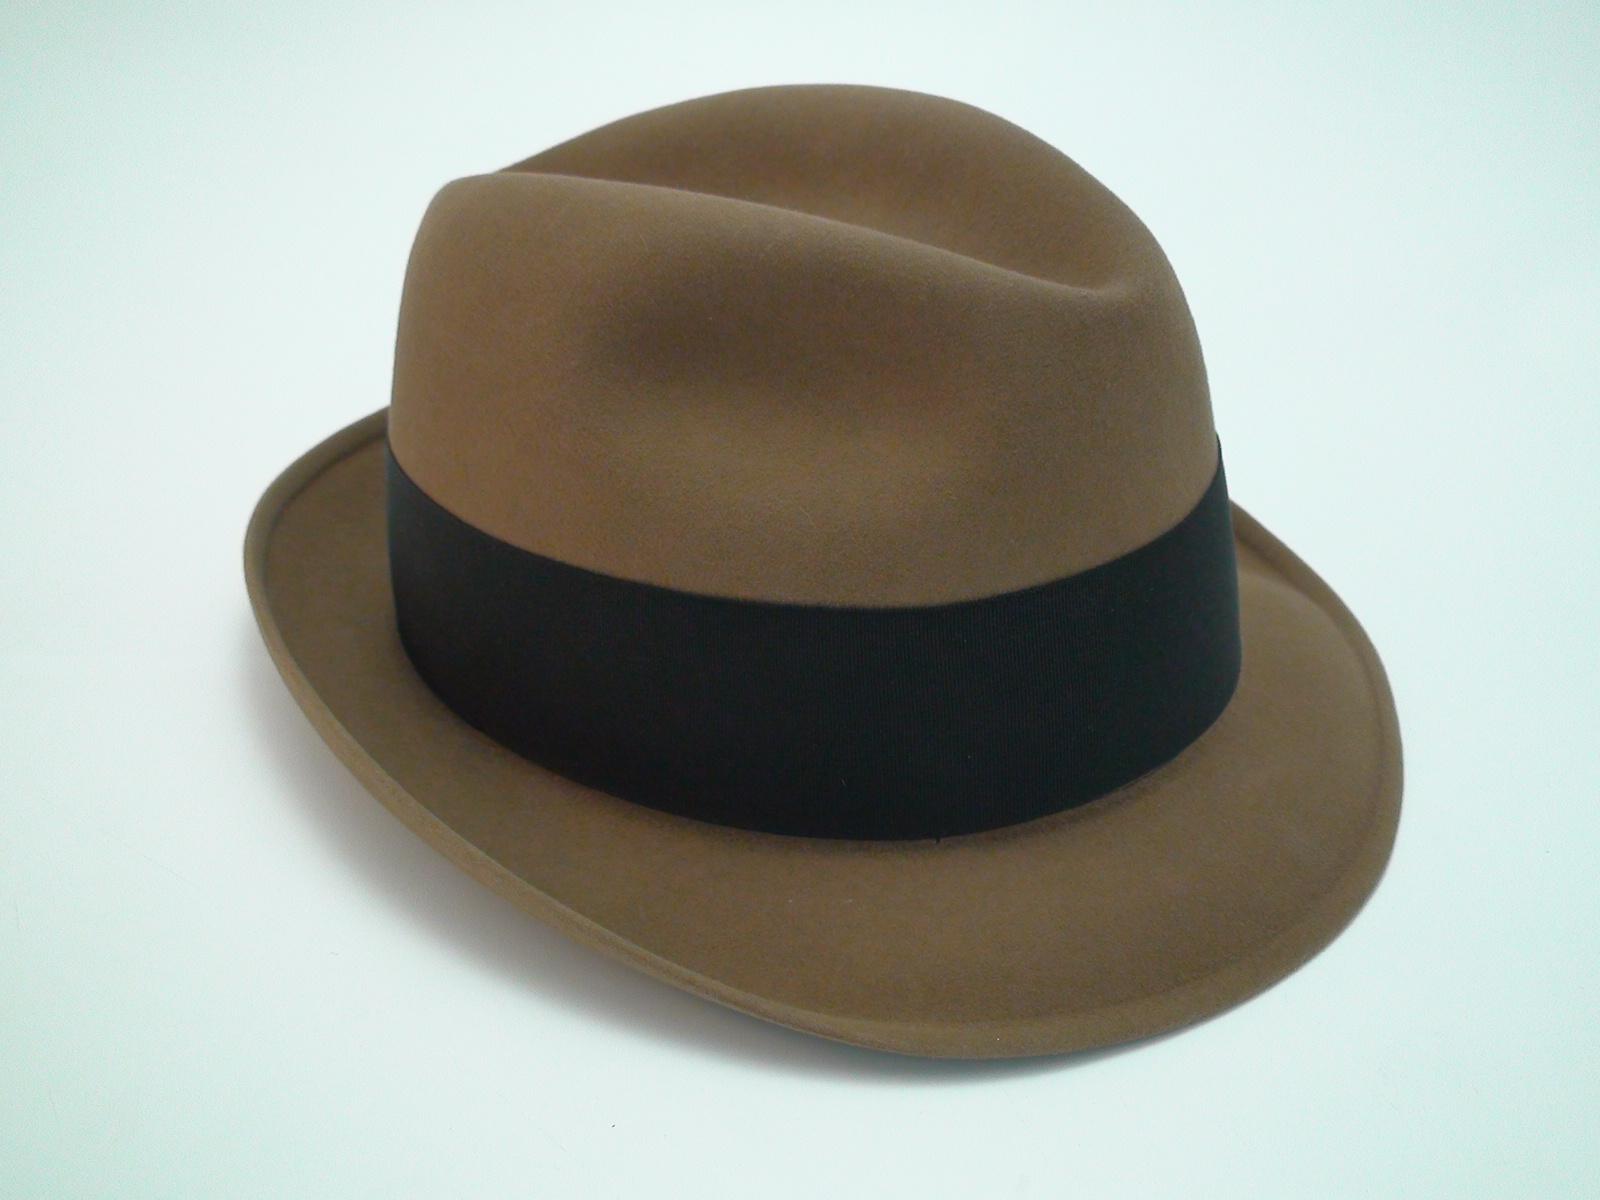 ae9c3e8fc3c5f Resistol Self Conforming 3X Beaver Kitten Finish Beige Fedora Hat